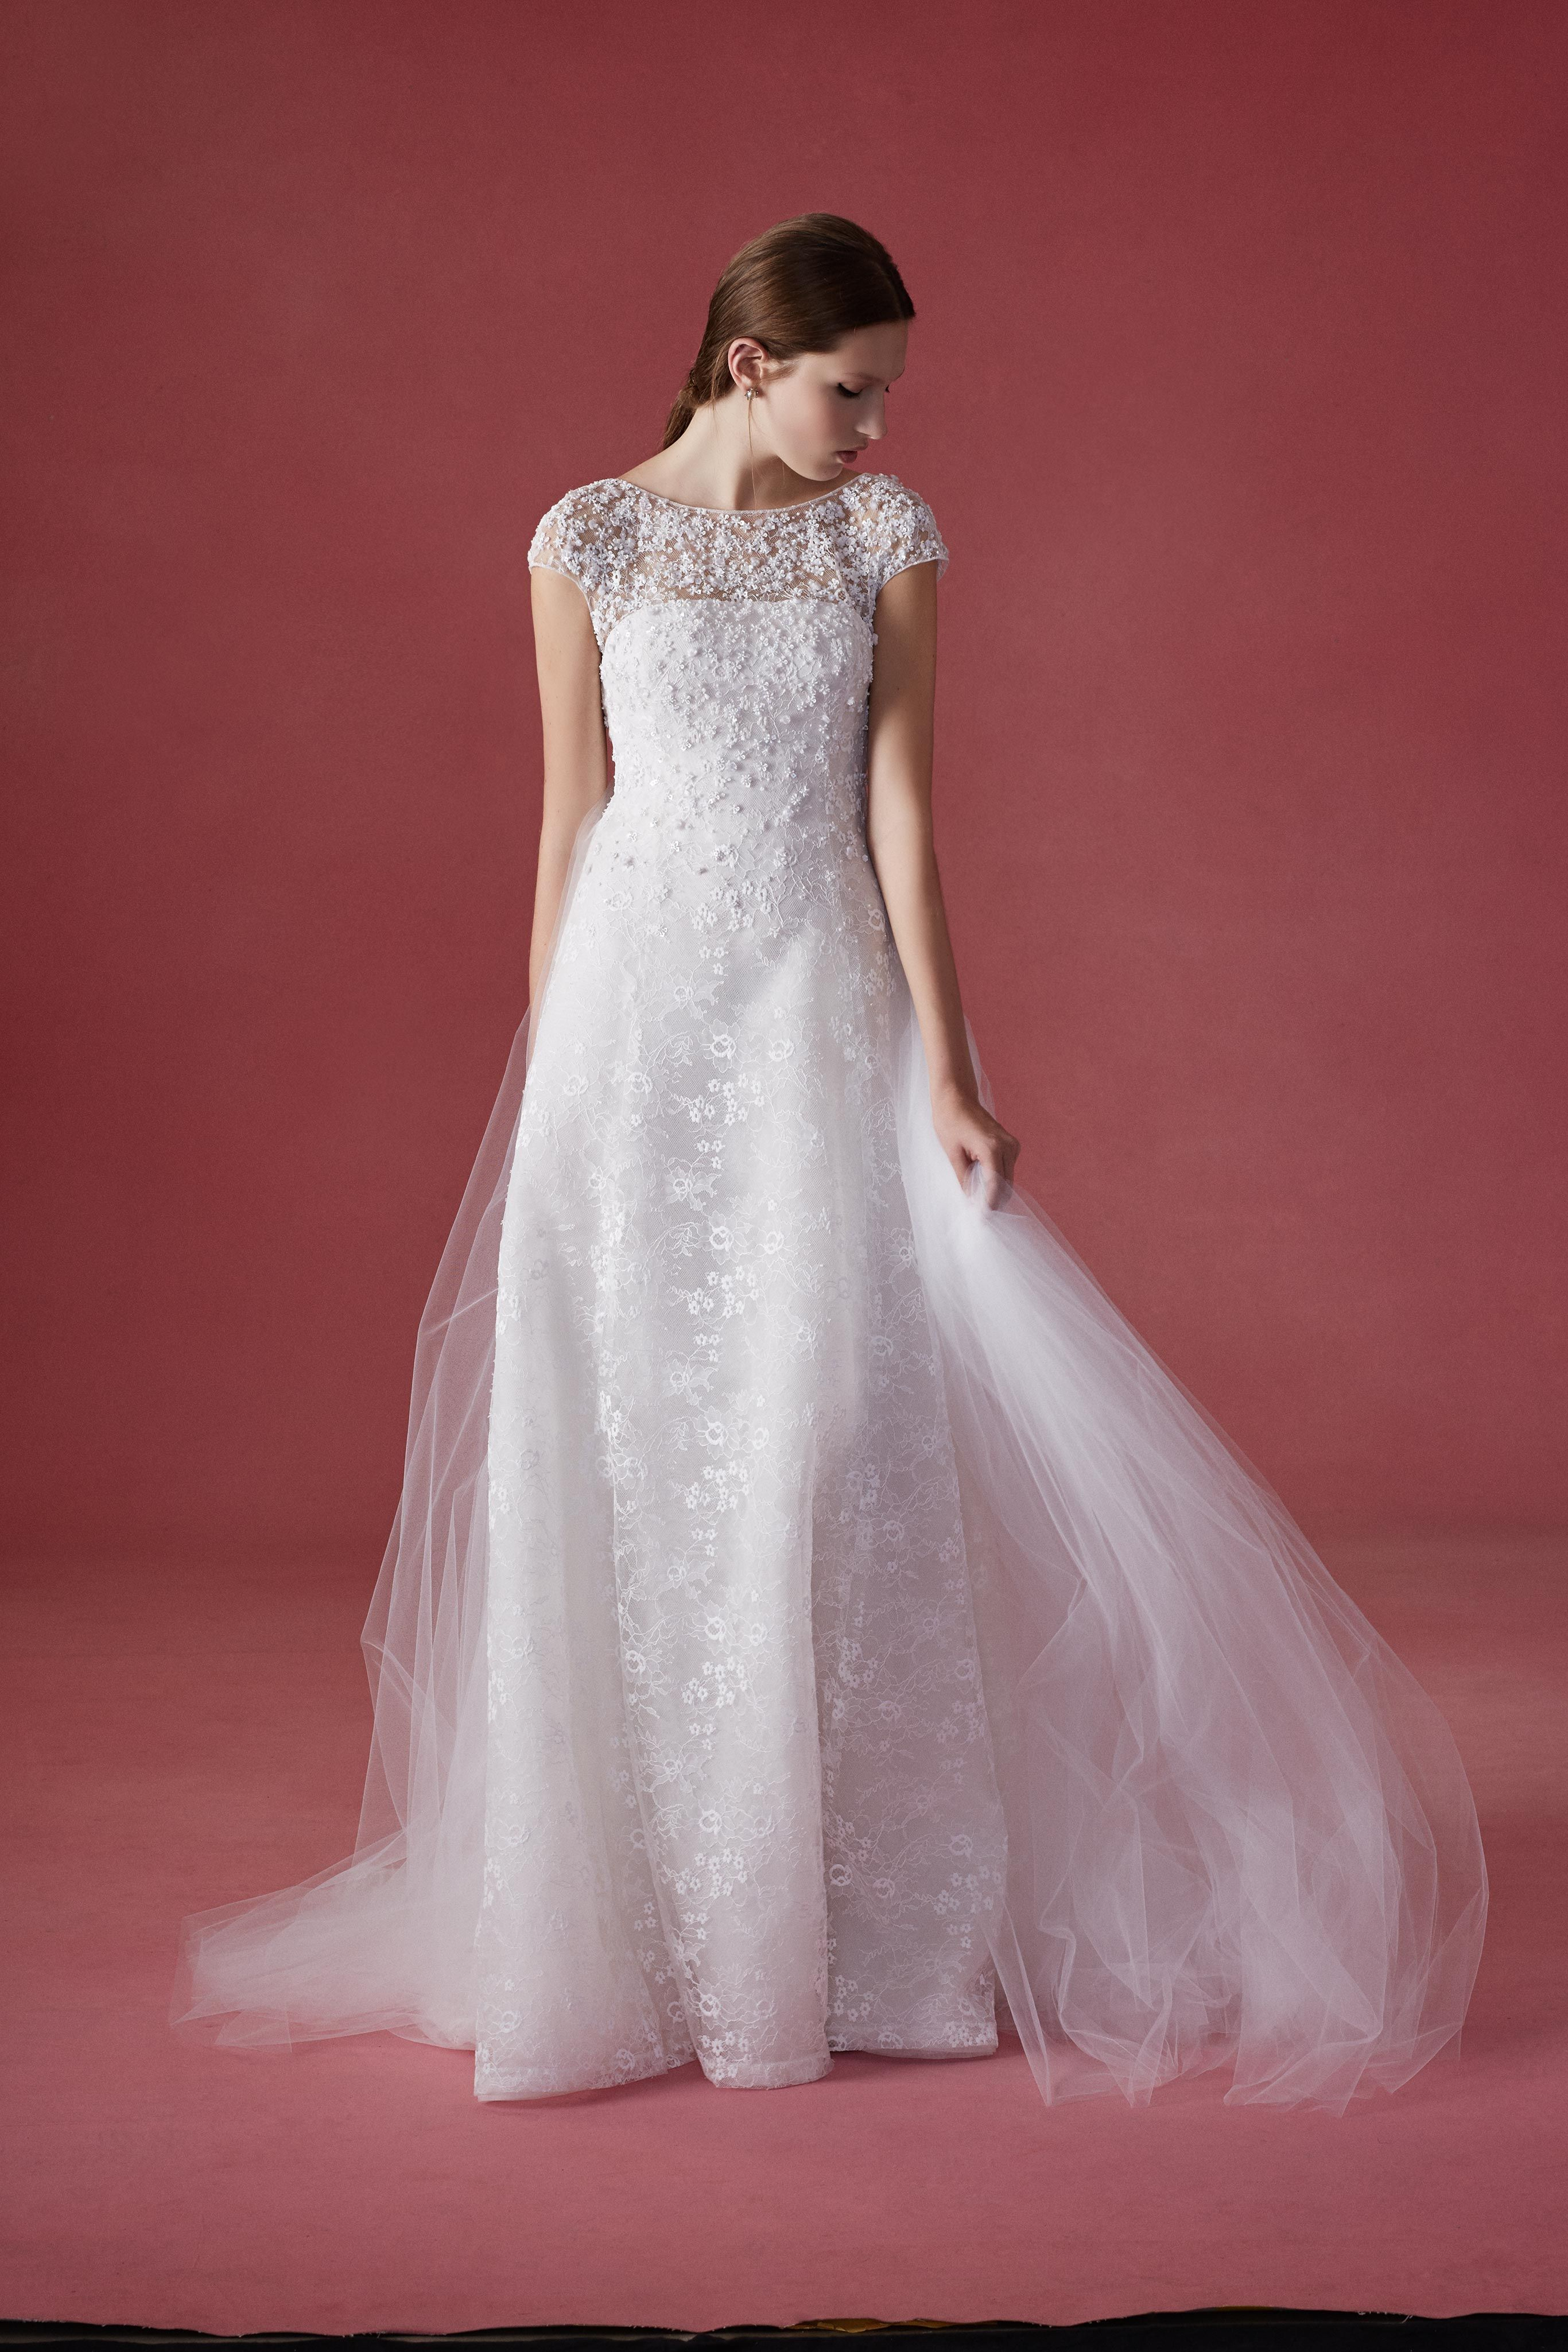 Elite wedding dresses  Oscar de la Renta fall  Bridal Farren  Luelite Bridal Boston